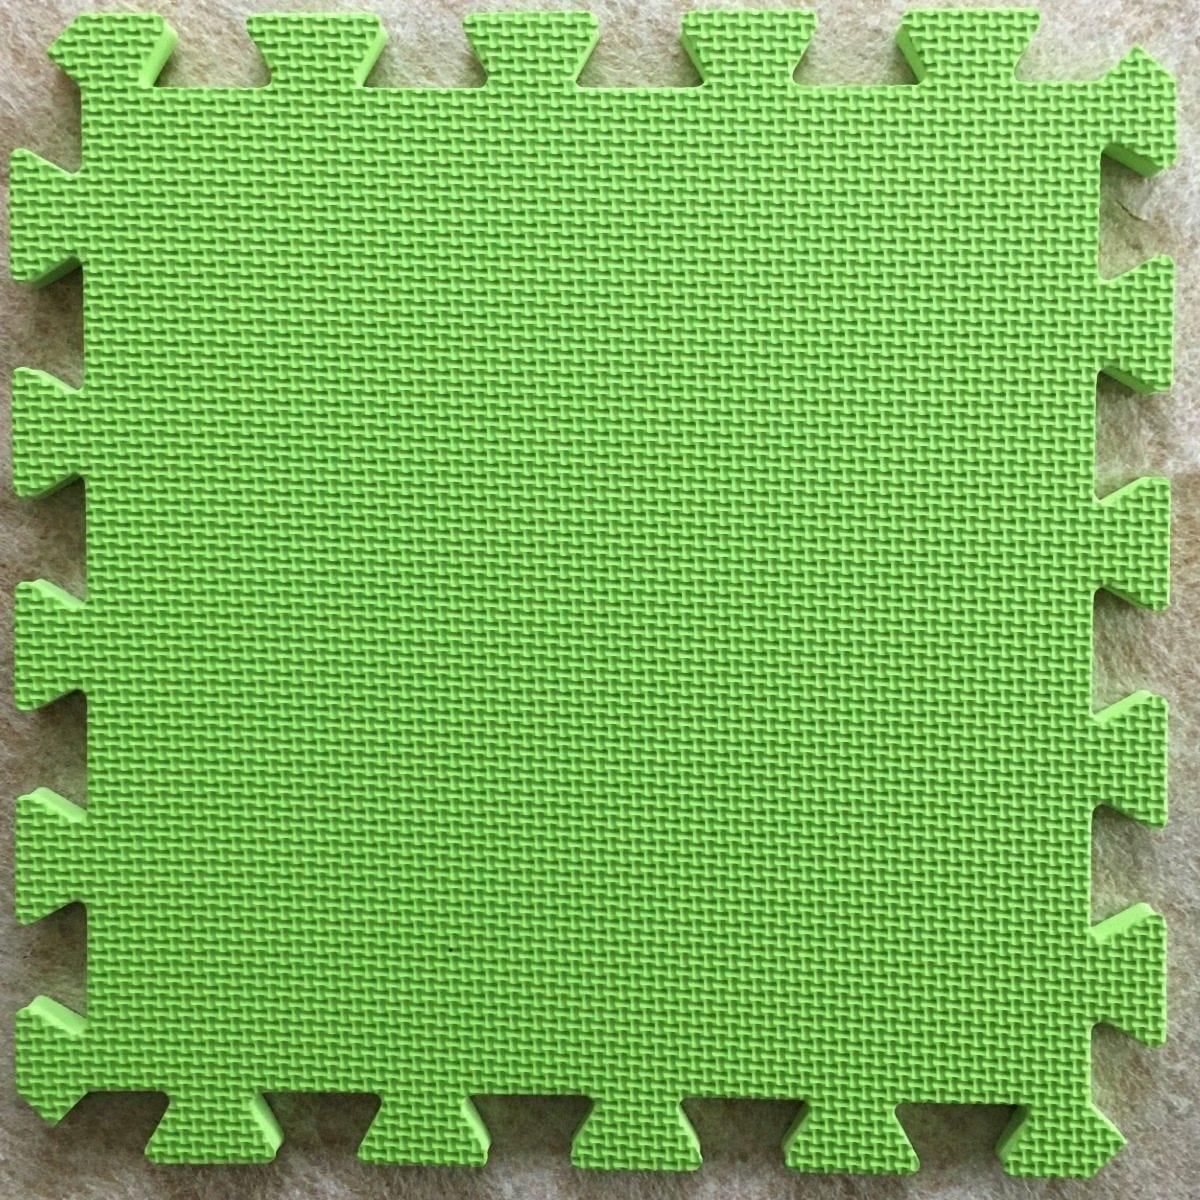 Warm Floor Tiling Kit - Playhouse 5 x 5ft Green